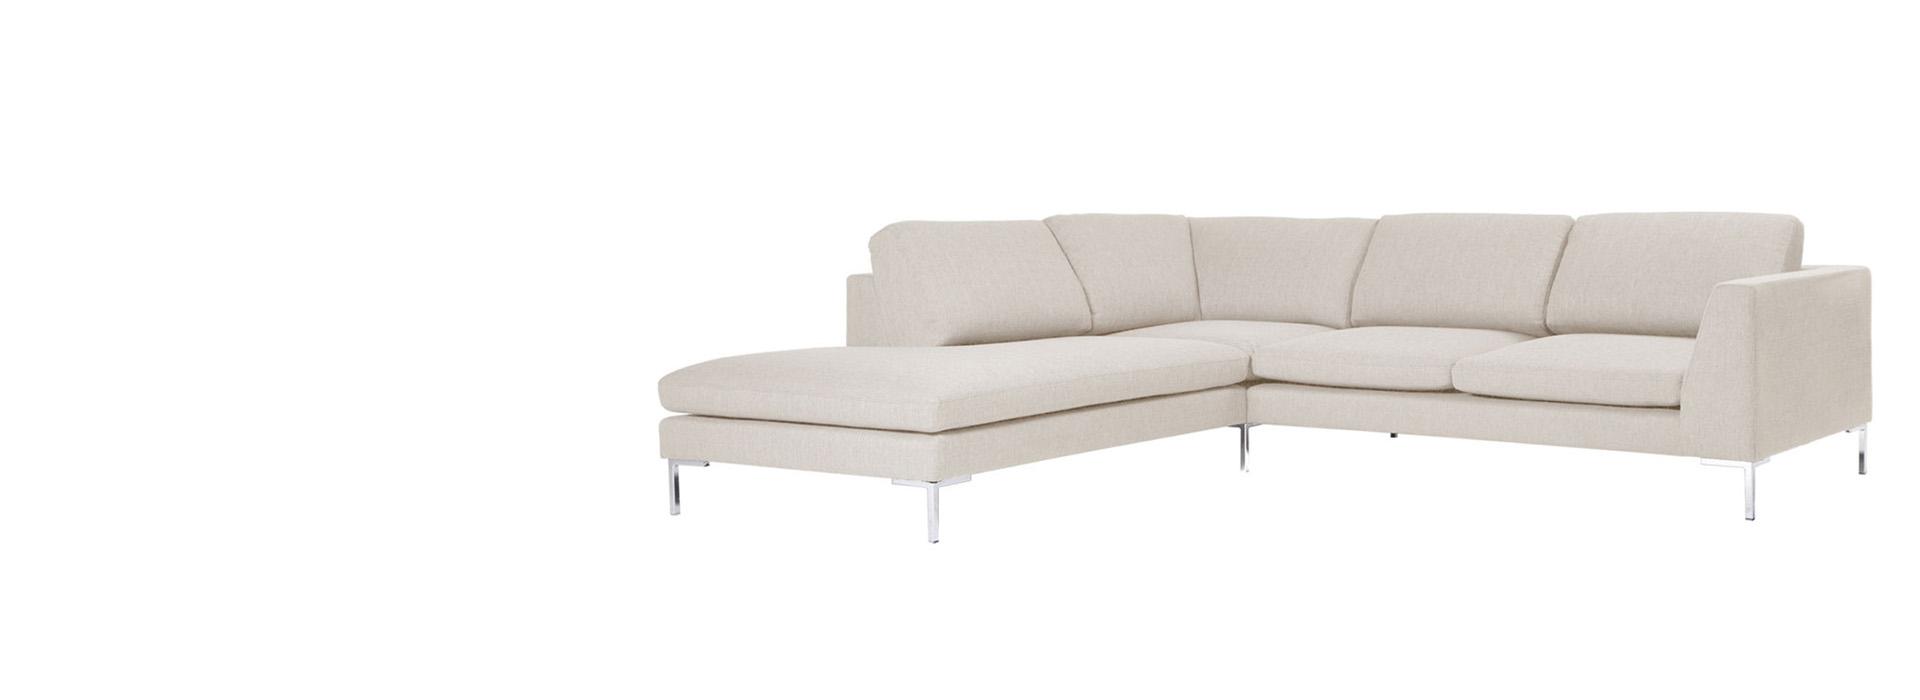 Full Size of Goodlife Sofa Furniture Malaysia Signet Good Life Couch Love Amazon Machalke Polster Reinigen Ecksofa Garten 3 Teilig Franz Fertig Englisch Hay Mags Sitzer Sofa Goodlife Sofa